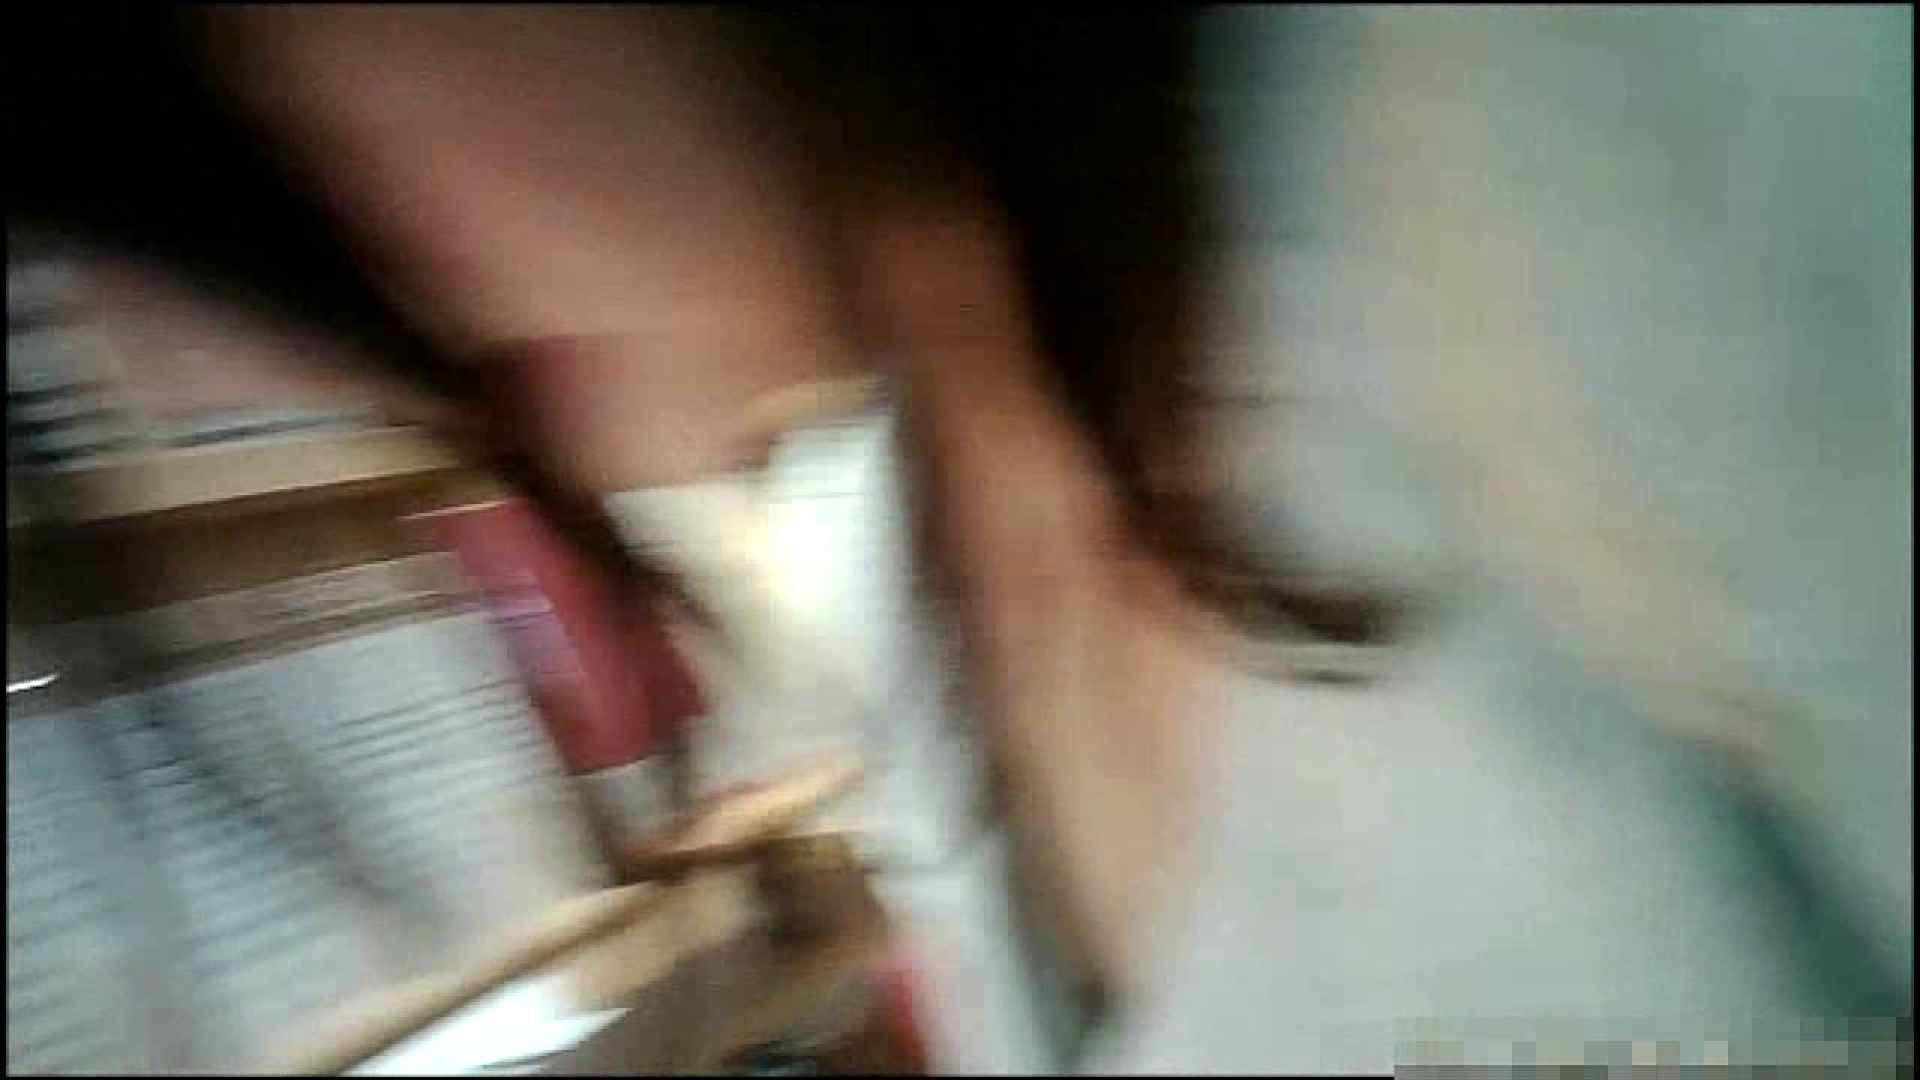 NO.3 友人間の情報で「処女」が確定している友達【某有名雑貨店】 チラ  69pic 37